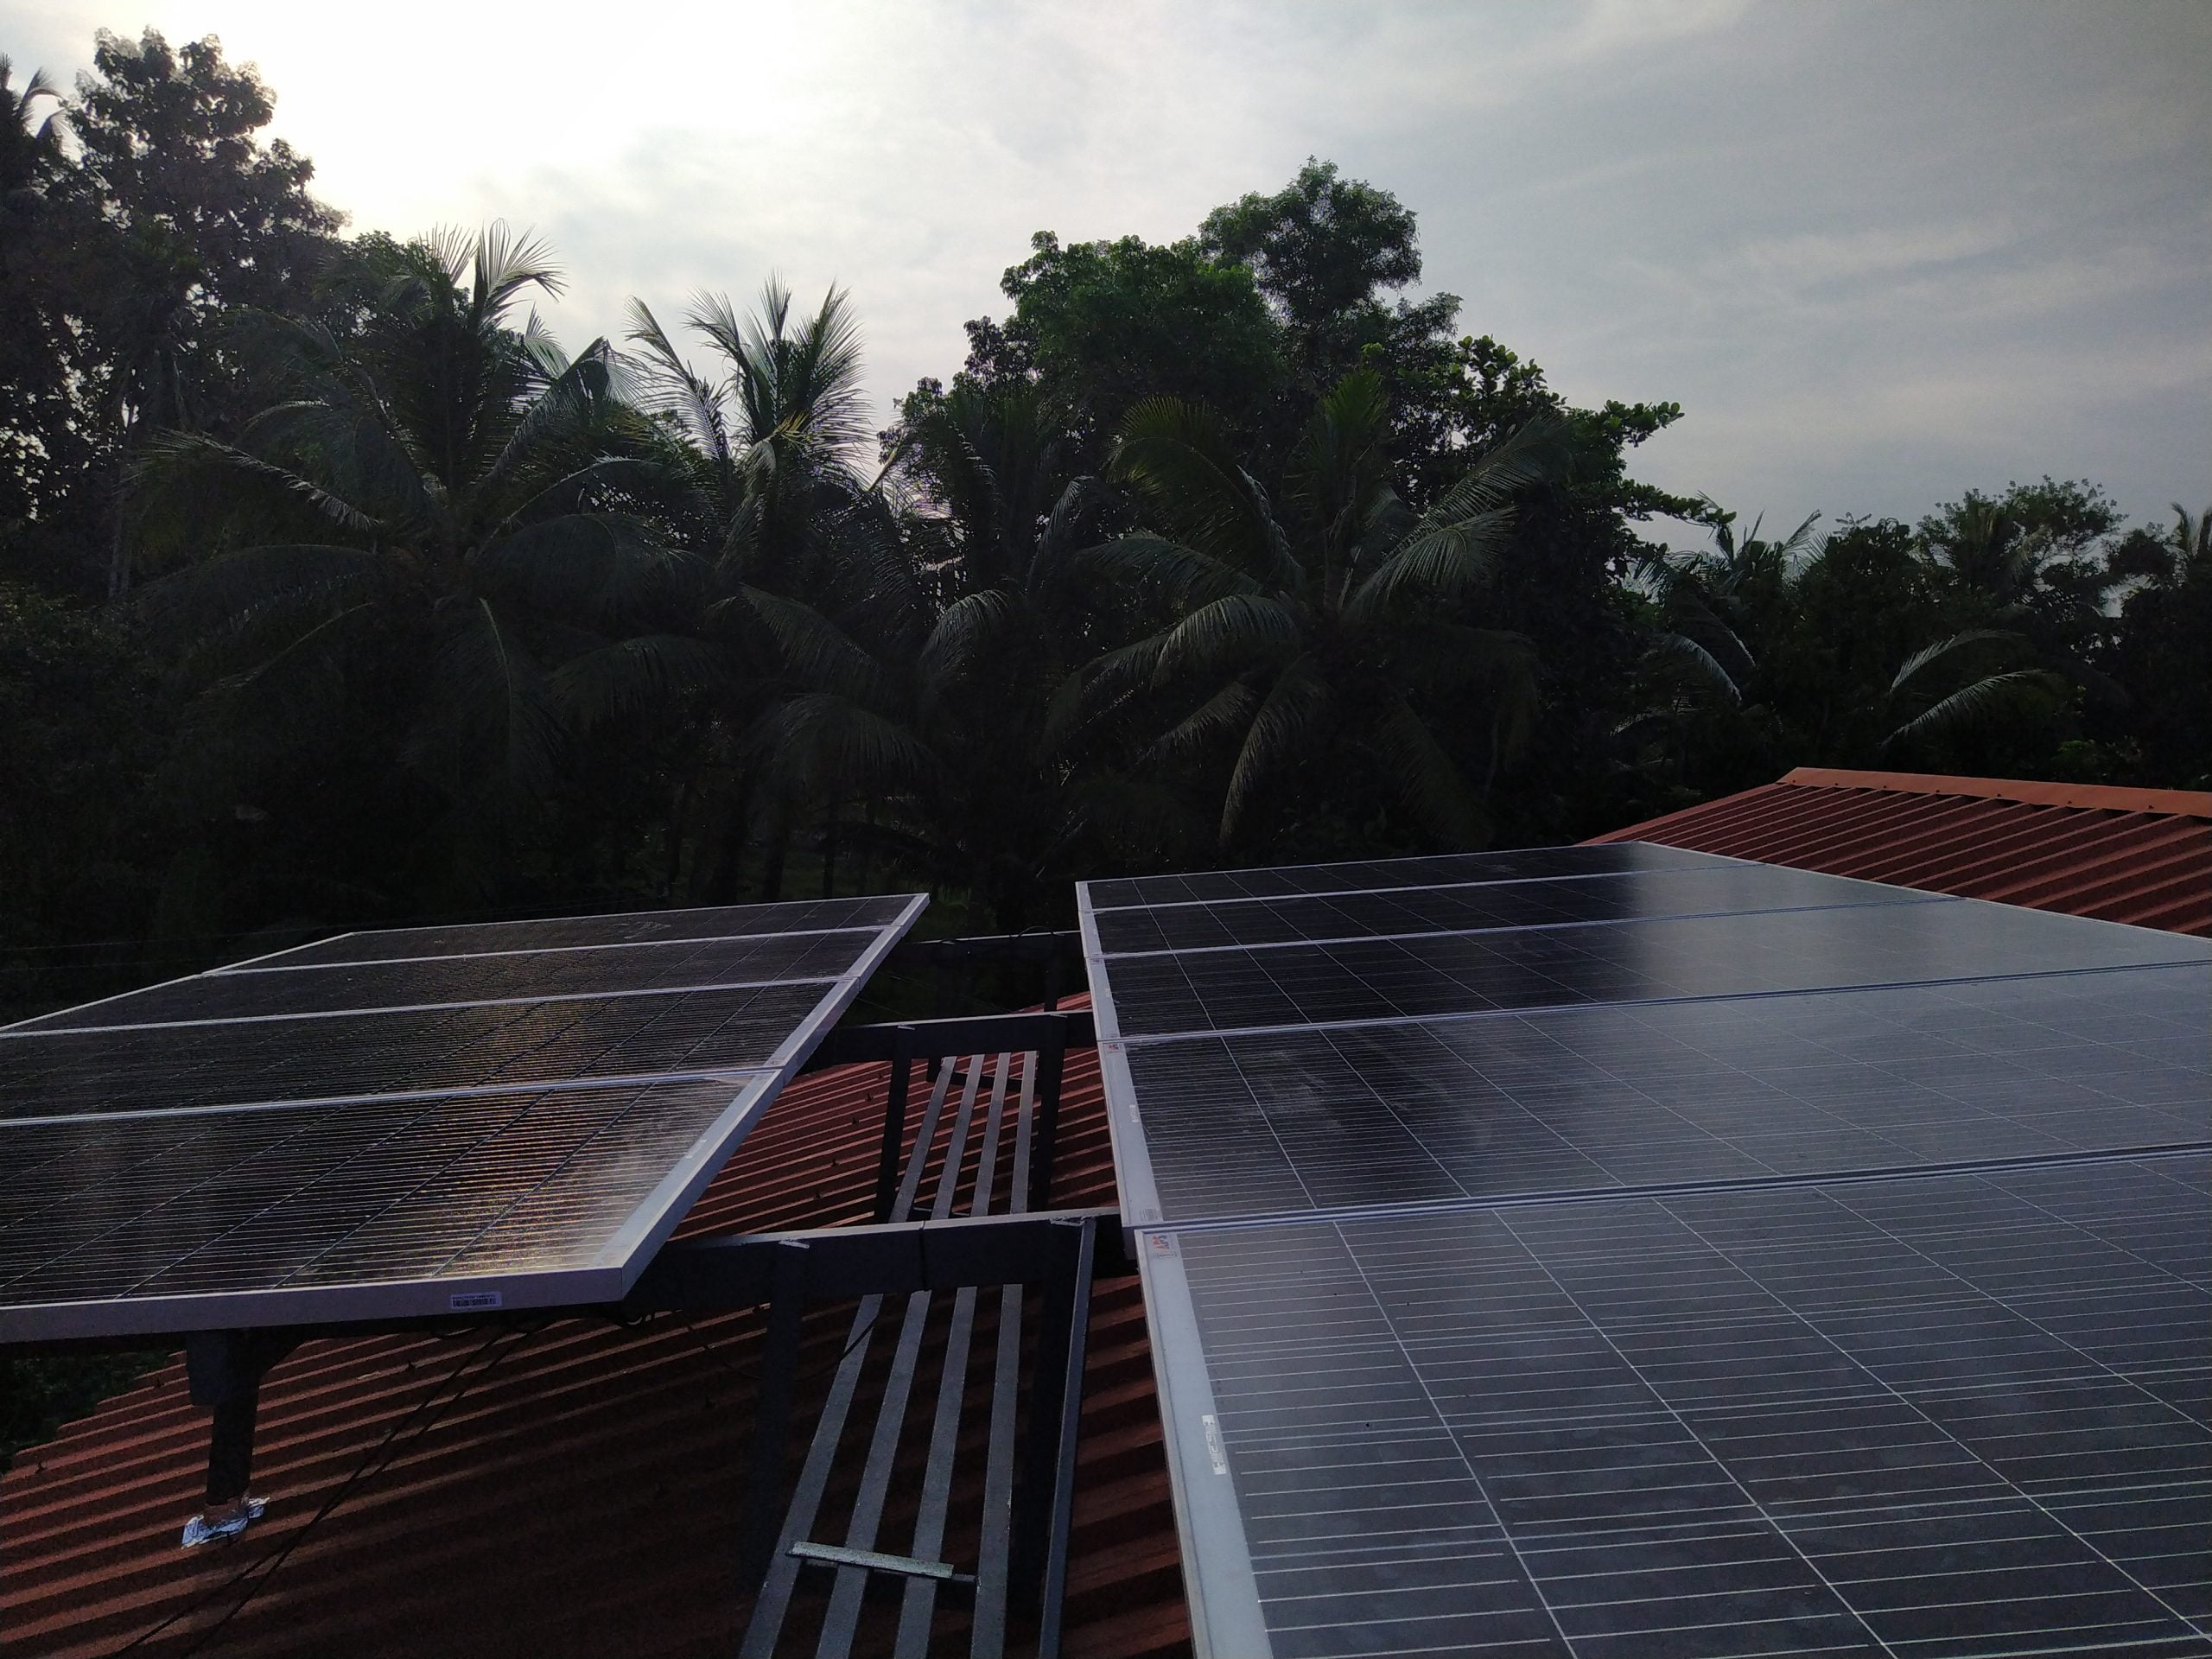 Sofar solar ongrid inverter, with Australian Solar panel of 335W, Harippad, Kerala